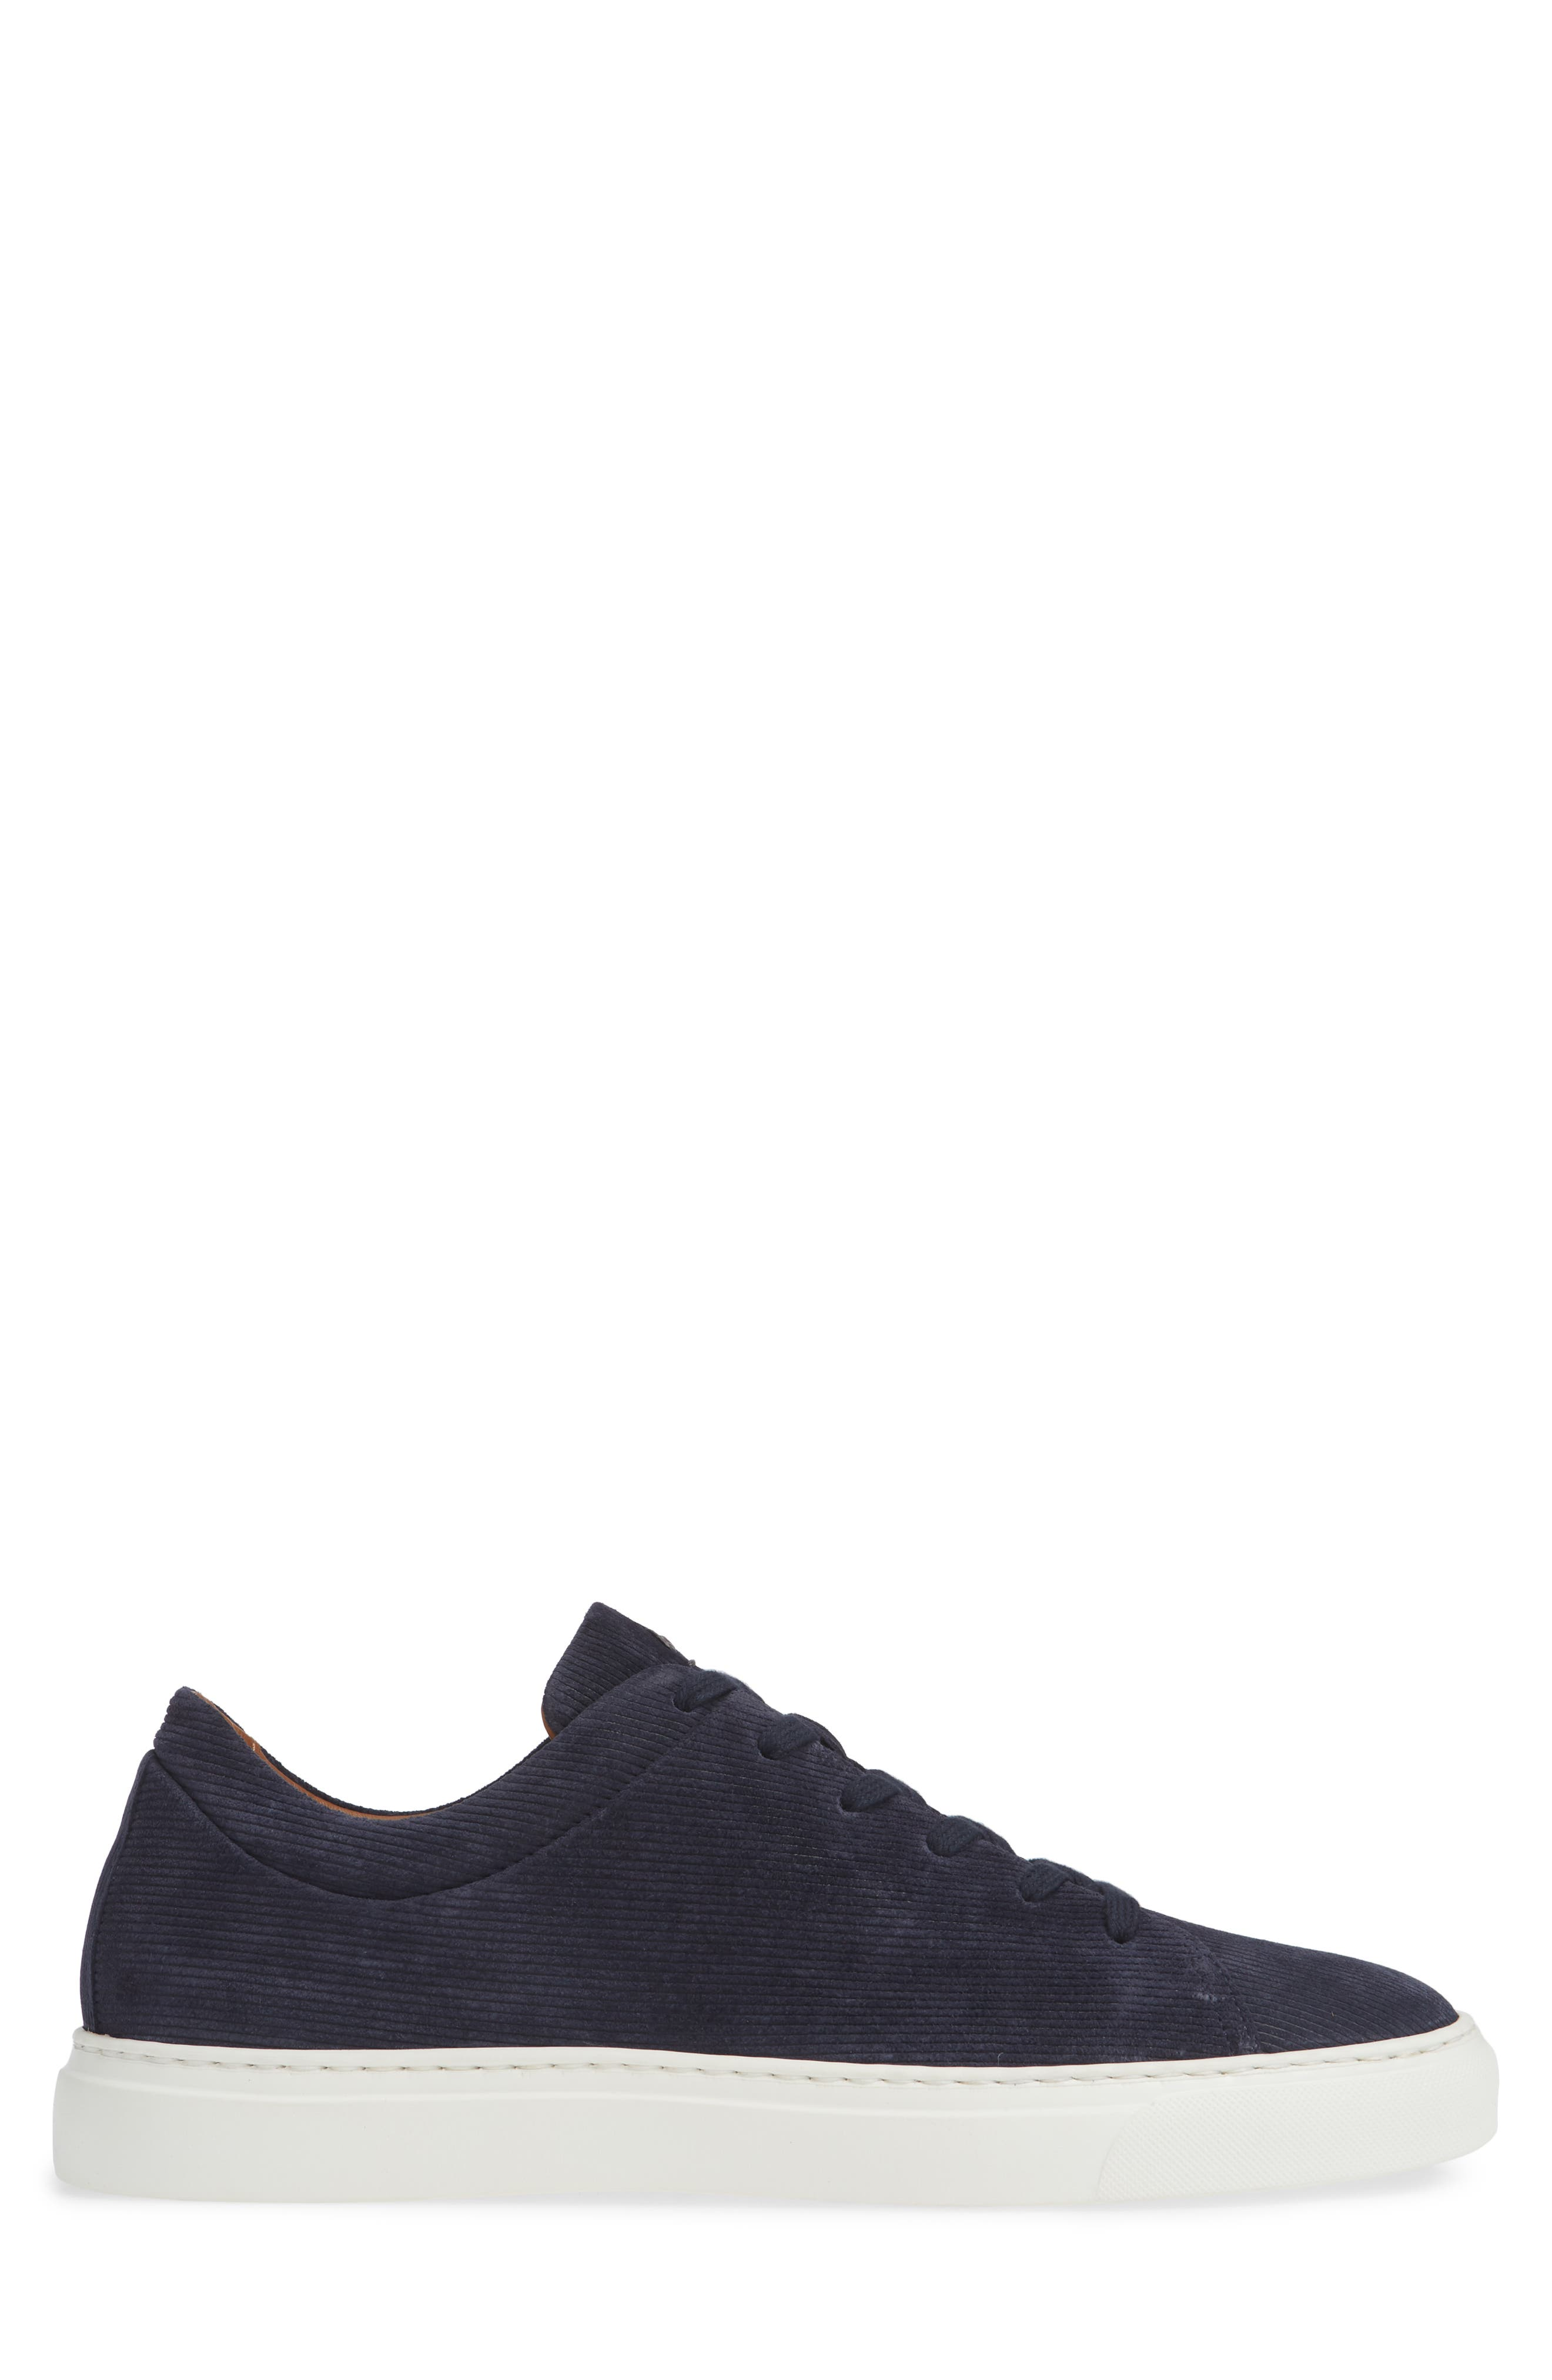 Alaric Sneaker,                             Alternate thumbnail 4, color,                             Navy Suede